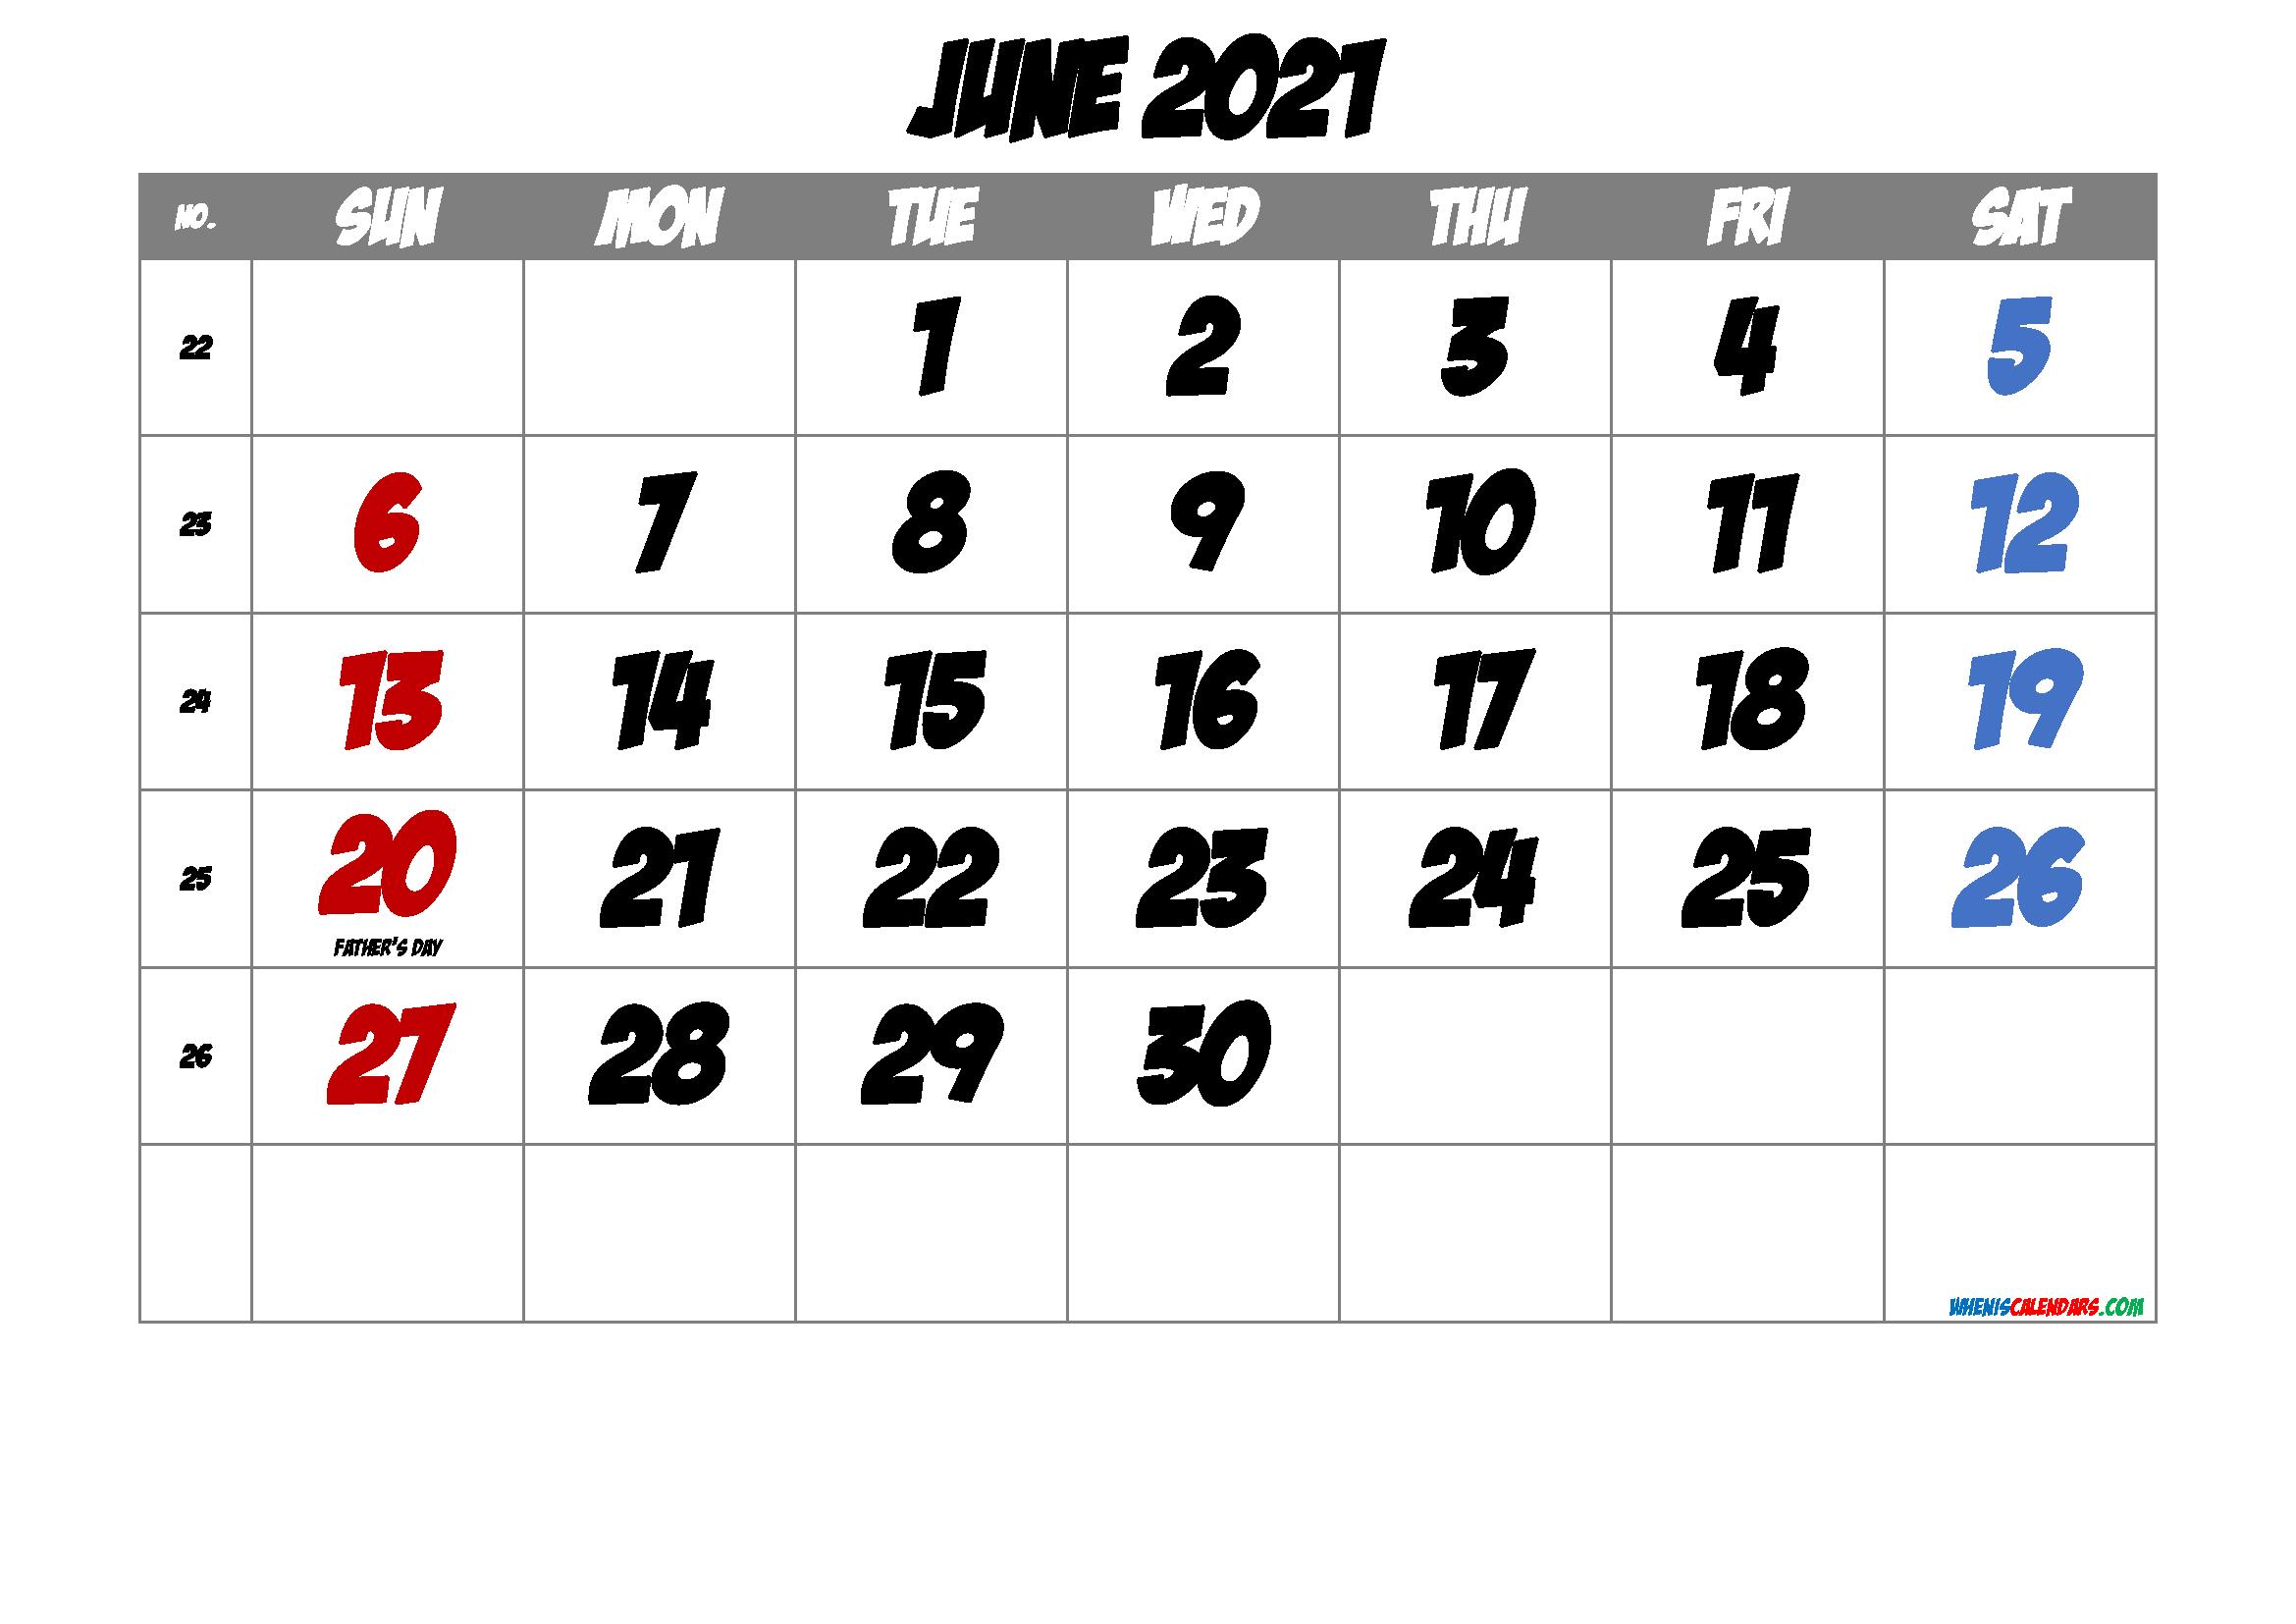 June 2021 Printable Calendar with Holidays